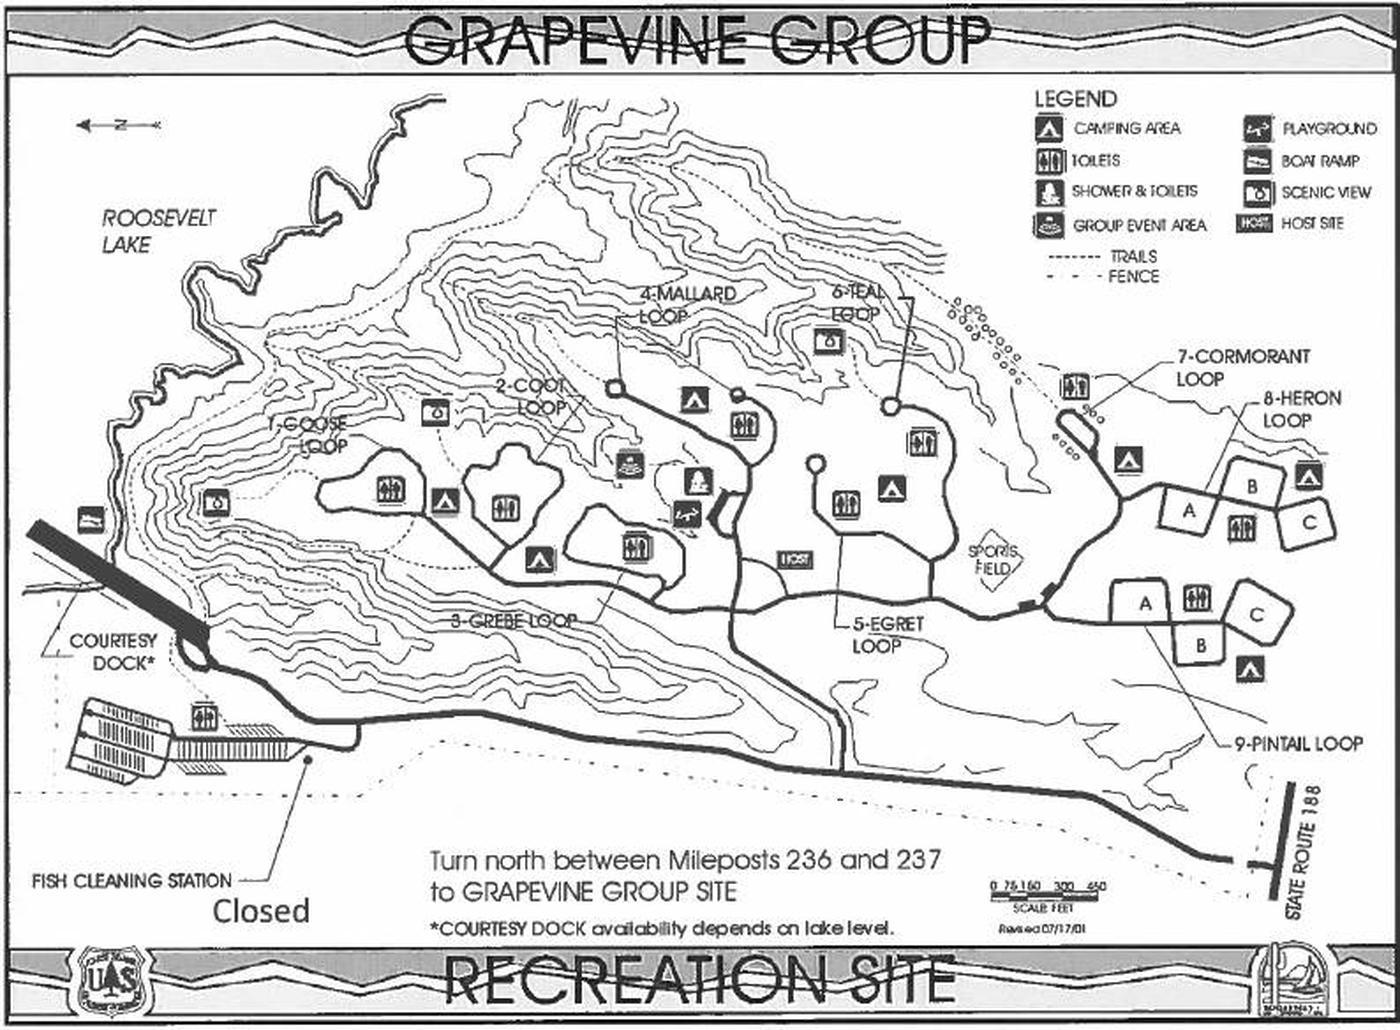 GRAPEVINE GROUP RECREATION SITELoops